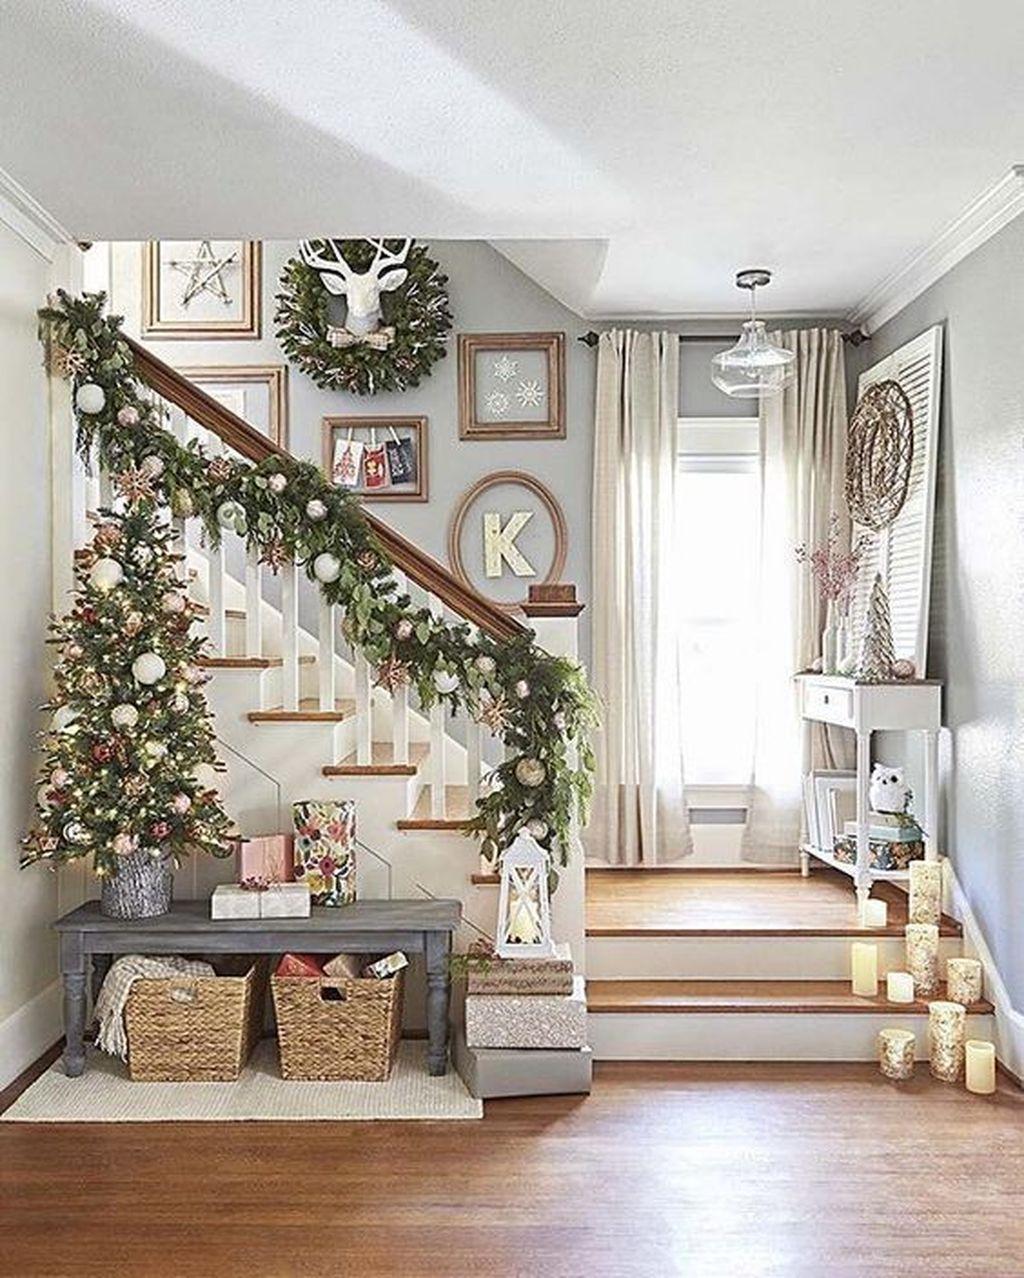 Simple Home Decor: 38 Simple Home Decor Ideas For Christmas